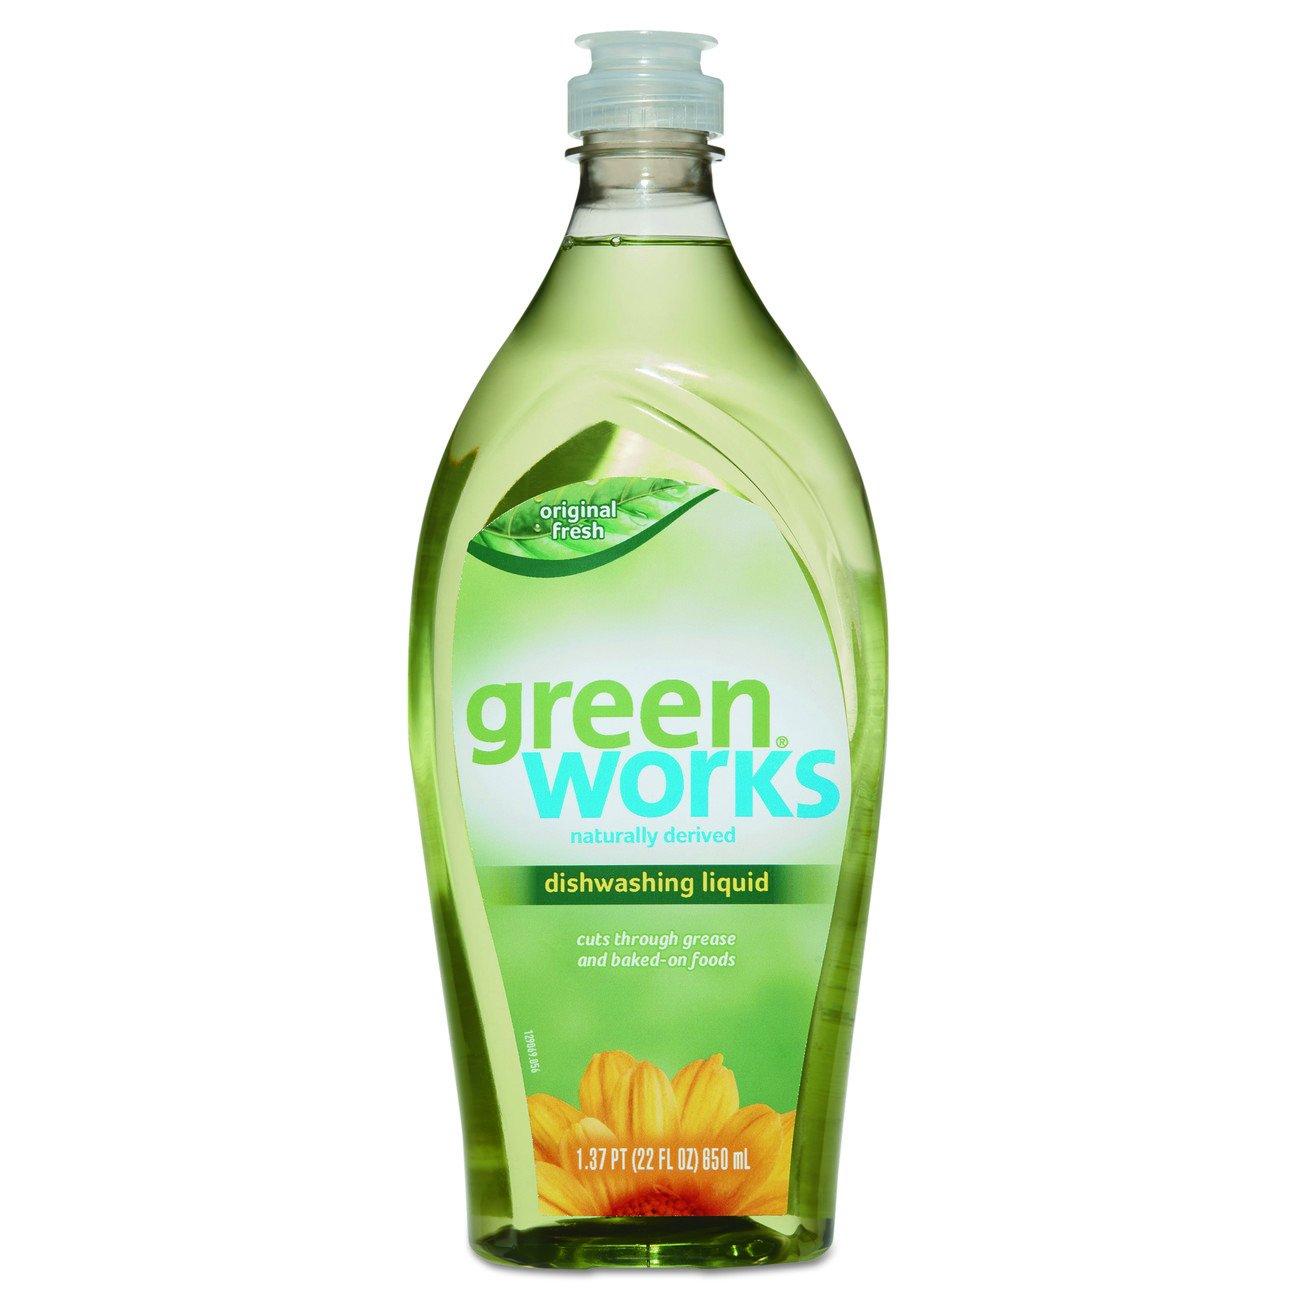 Green Works 31207 Manual Dishwashing Liquid Detergent, Original Fresh Scent, 22 oz. Volume, Ceramic, Corian (Pack of 6)